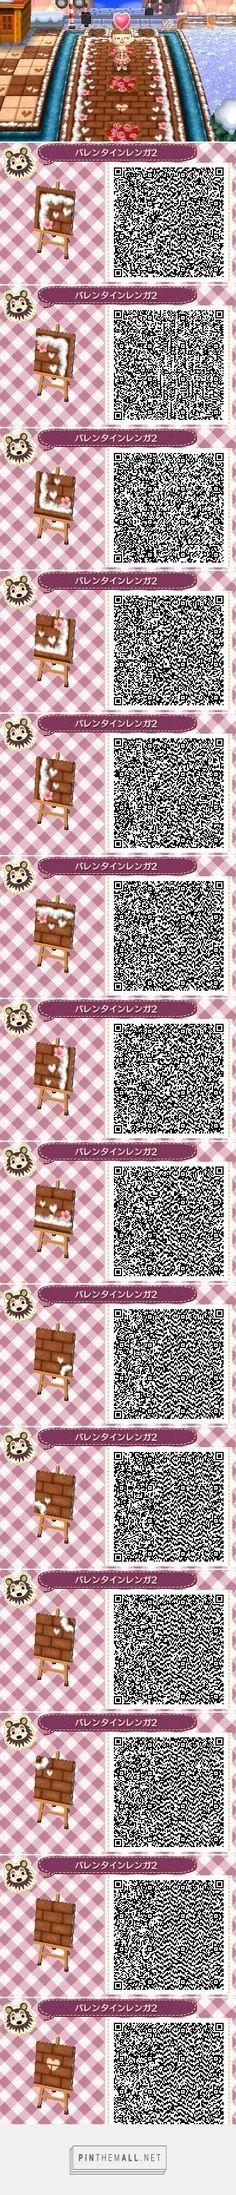 Vinyl Animal Crossing New Leaf Qr Codes Dress